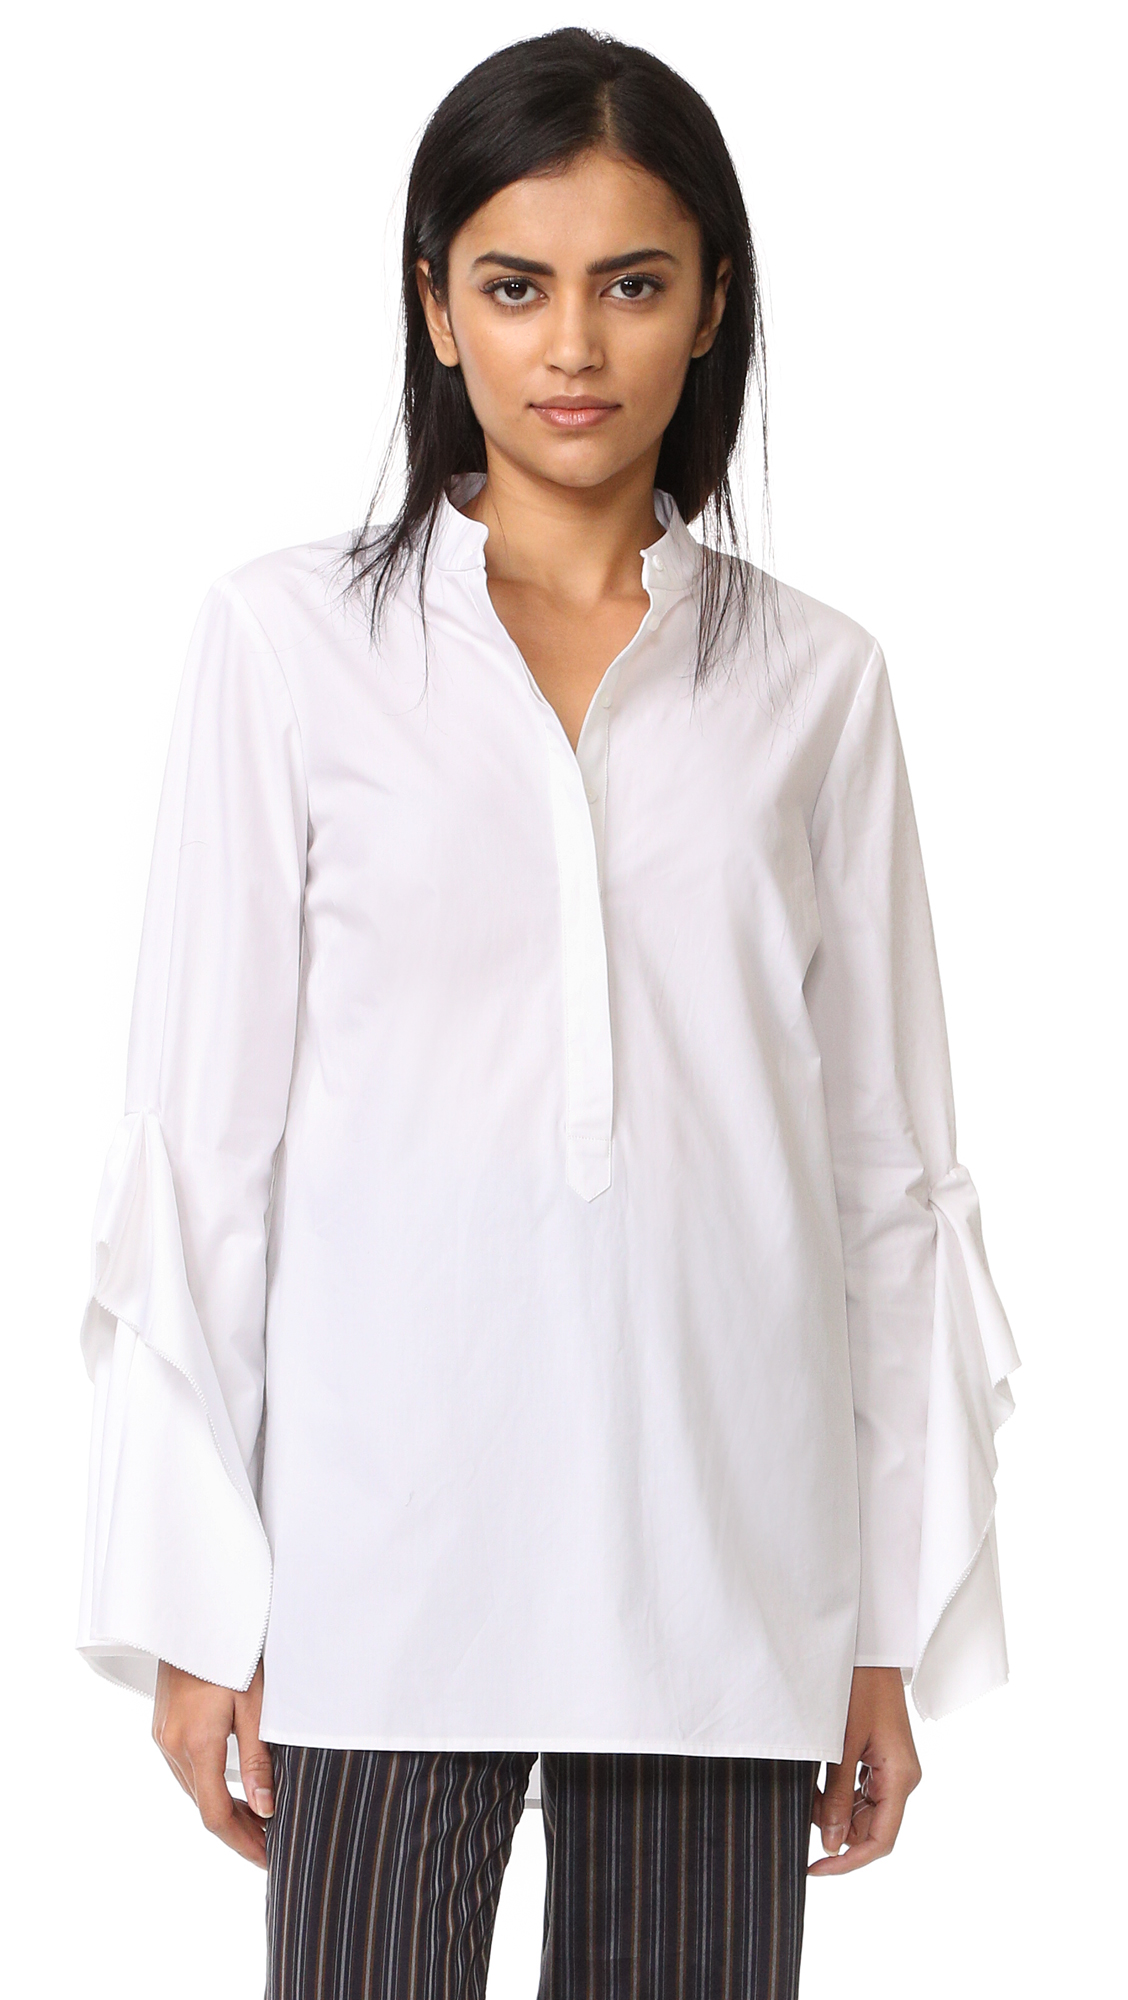 Acler Sloan Shirt - White at Shopbop